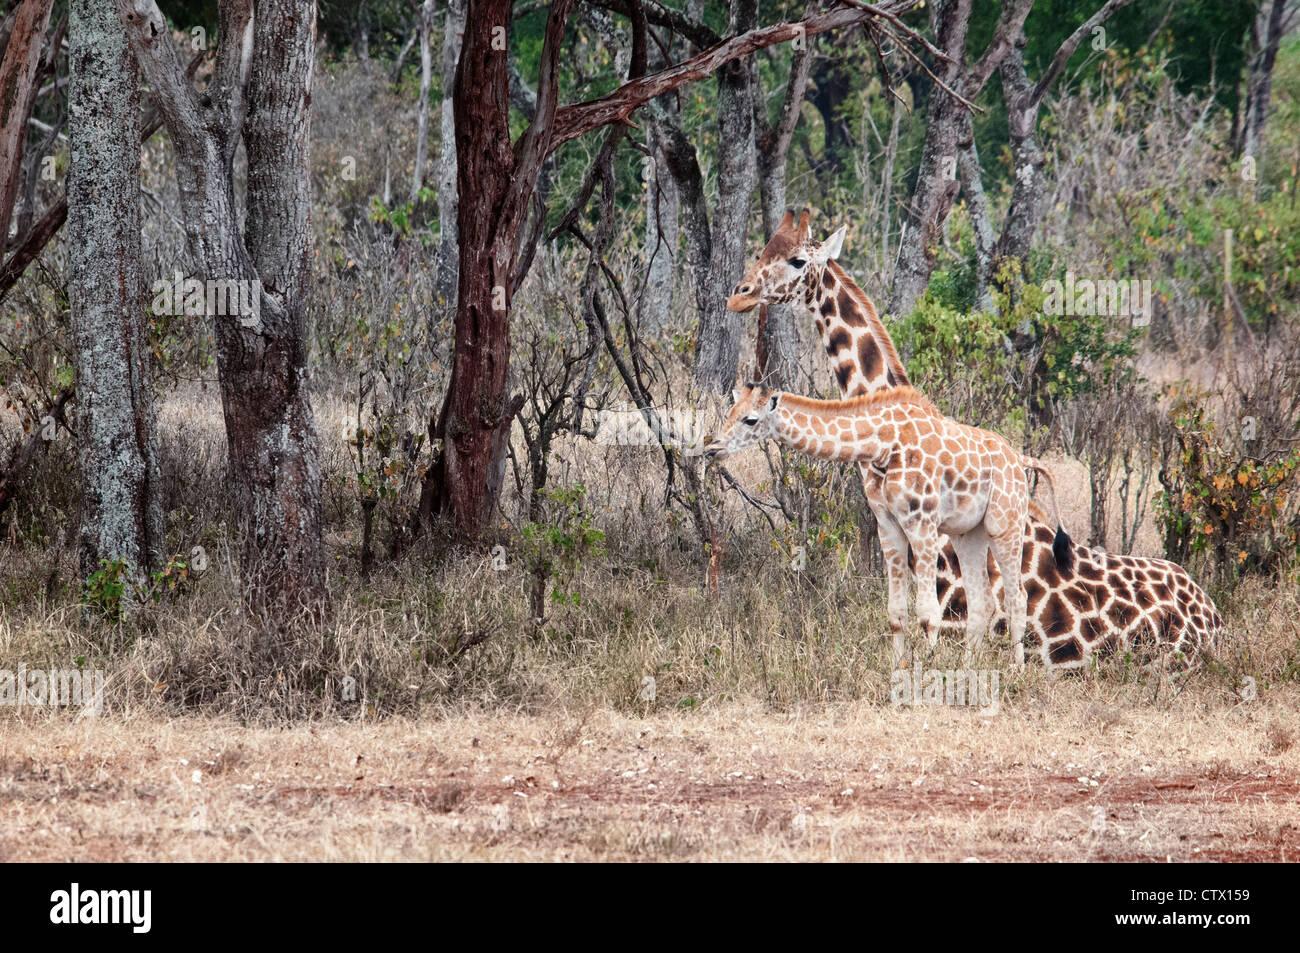 Girafe Rothschild Giraffa camelopardalis, Rothschild, mère assise avec son veau, Giraffe Manor, Nairobi, Kenya, Photo Stock